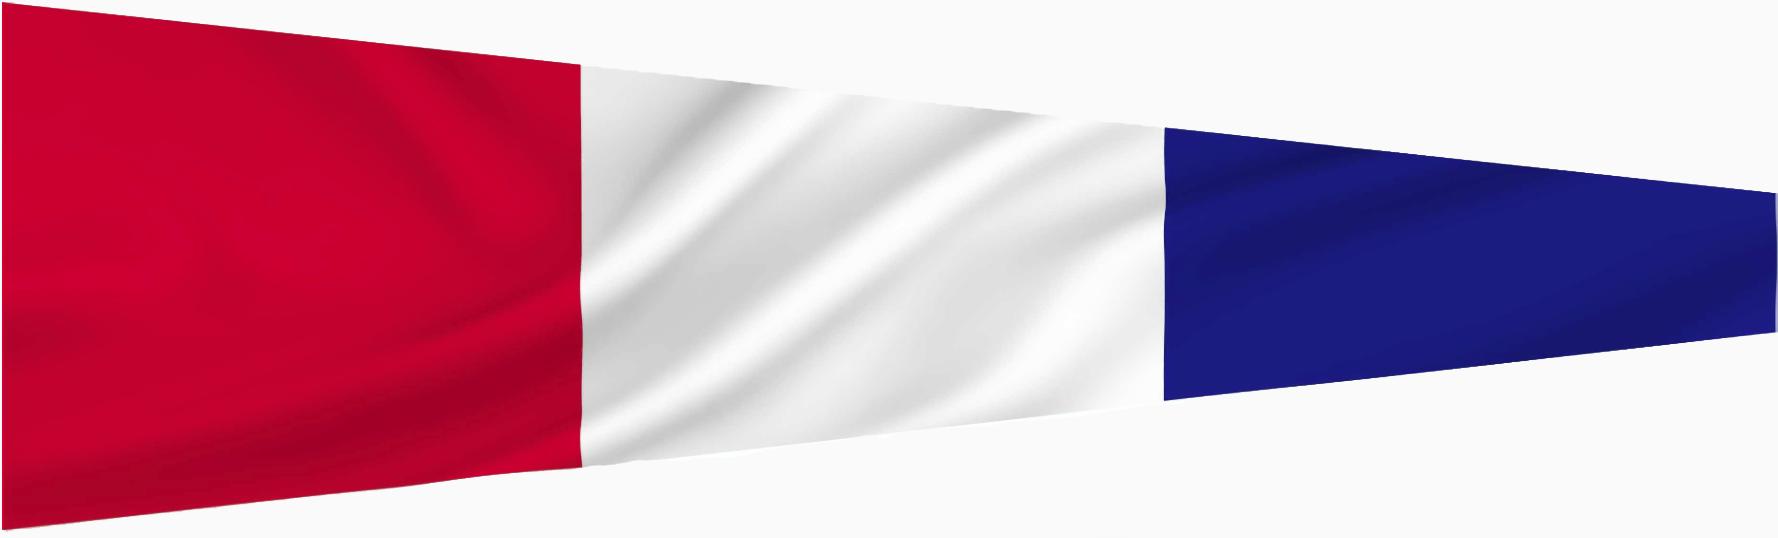 Tallstander 3 fra NOK 149 inkl.mva